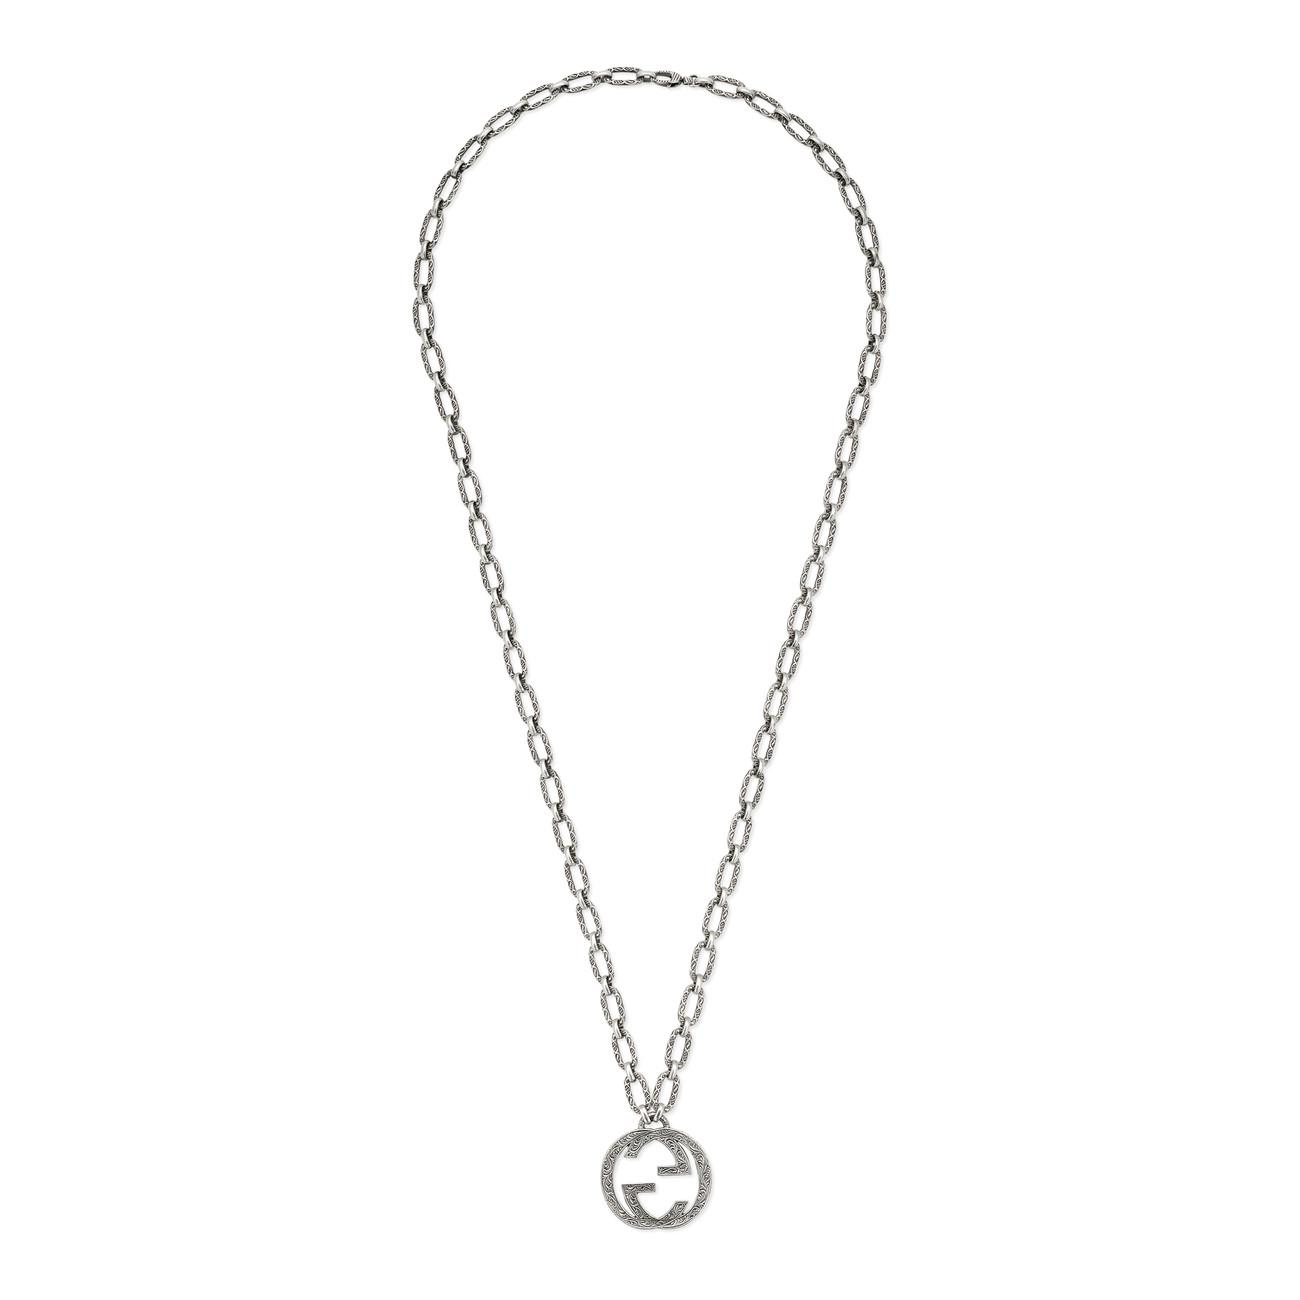 ee93e5ae9 Gucci Men S Sterling Silver Interlocking G Pendant Necklace ...